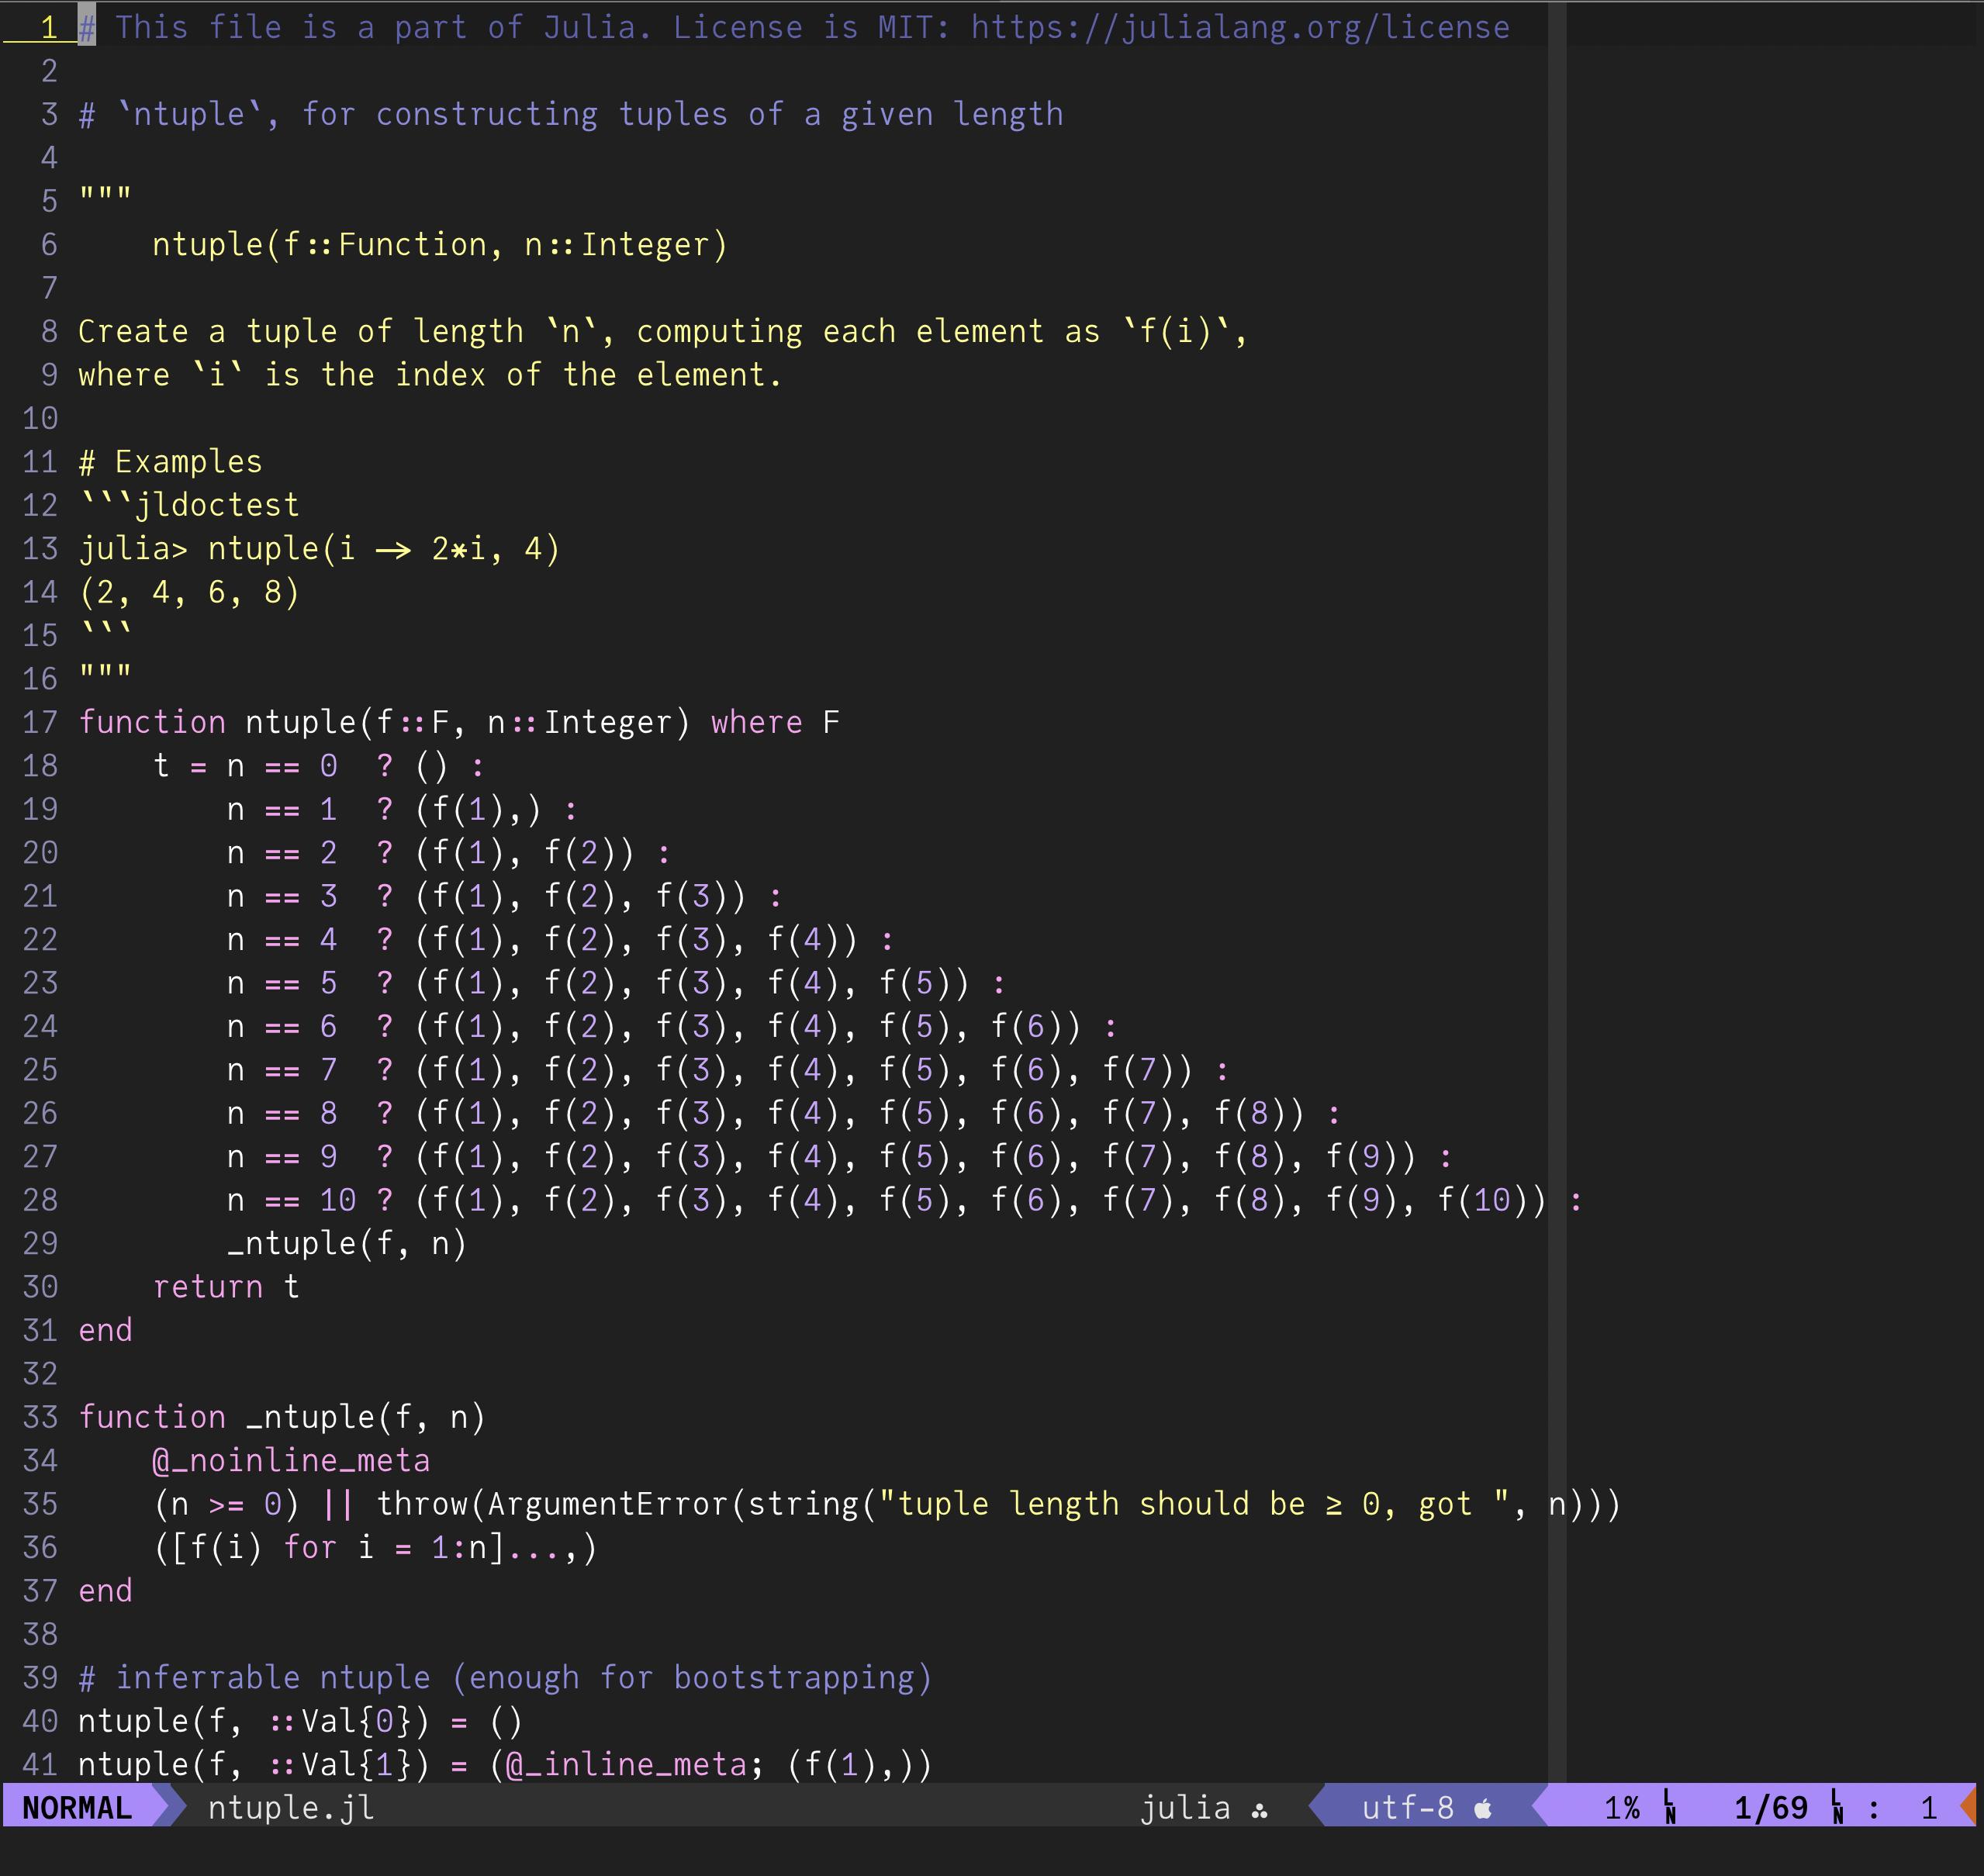 screenshot of VIM editor